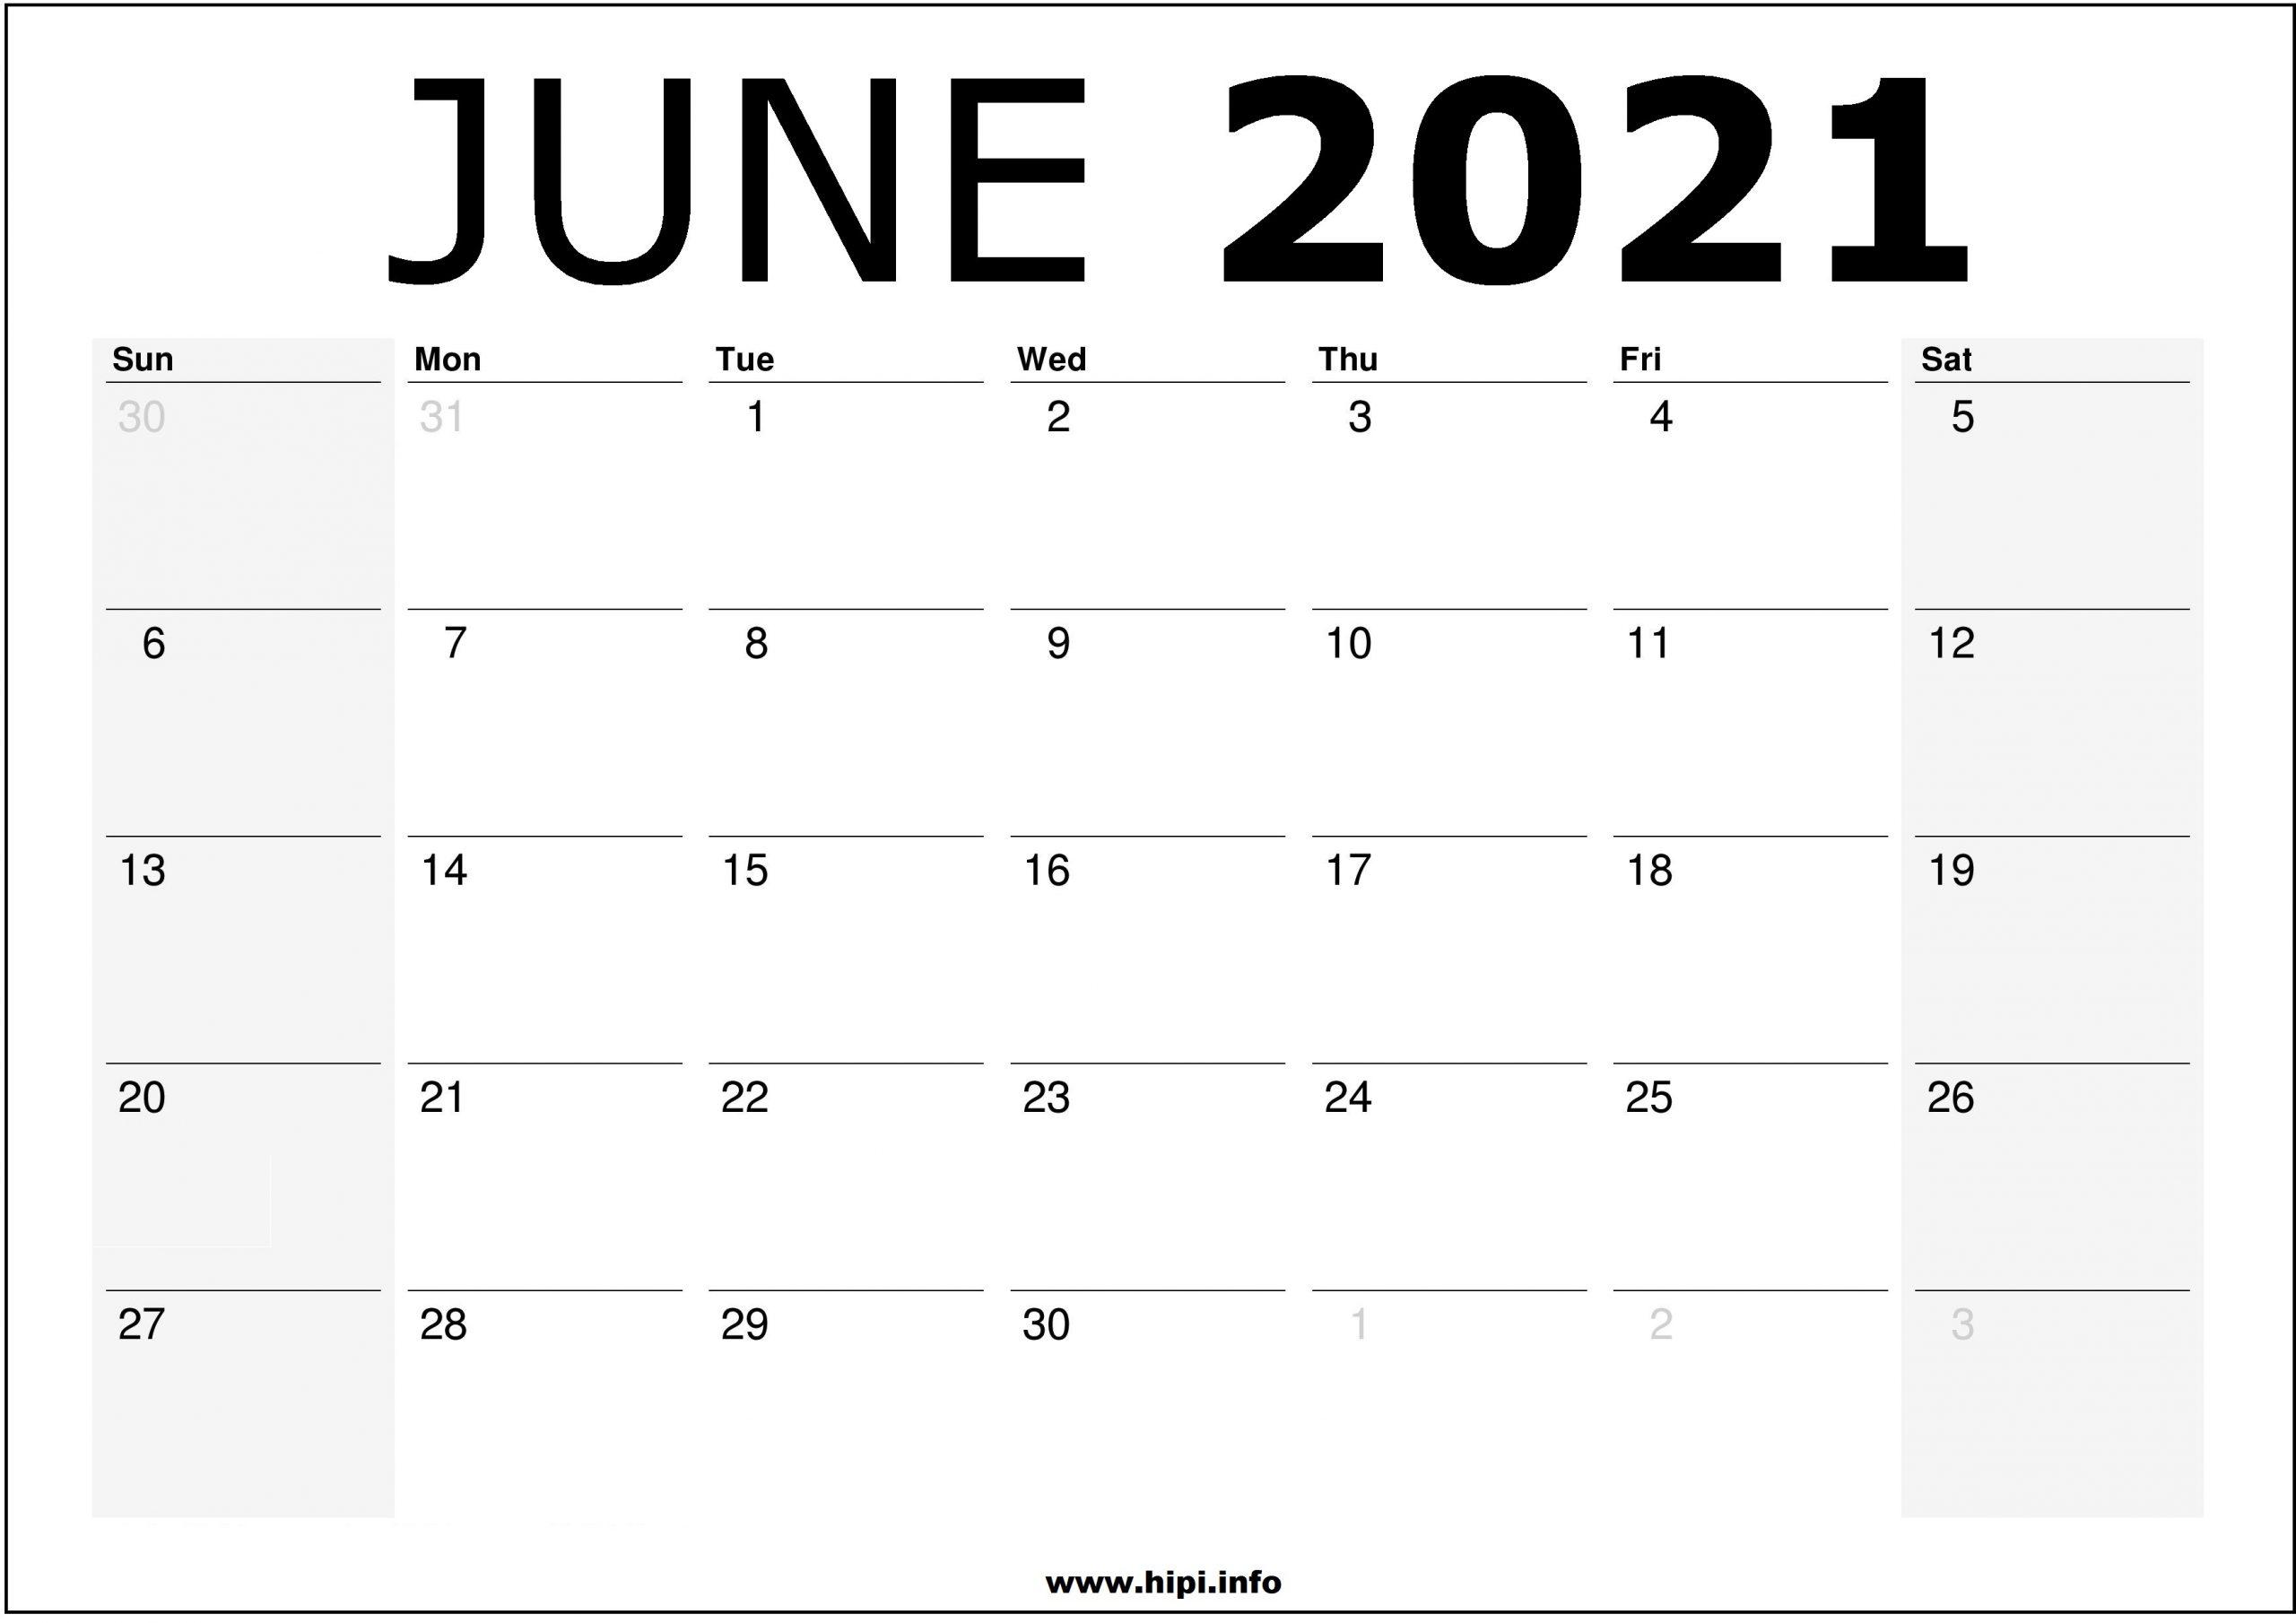 Printable Sunrise Sunset Calendar 2021 | Printable With Regard To Printable Sunrise/Sunset Tables For 2021